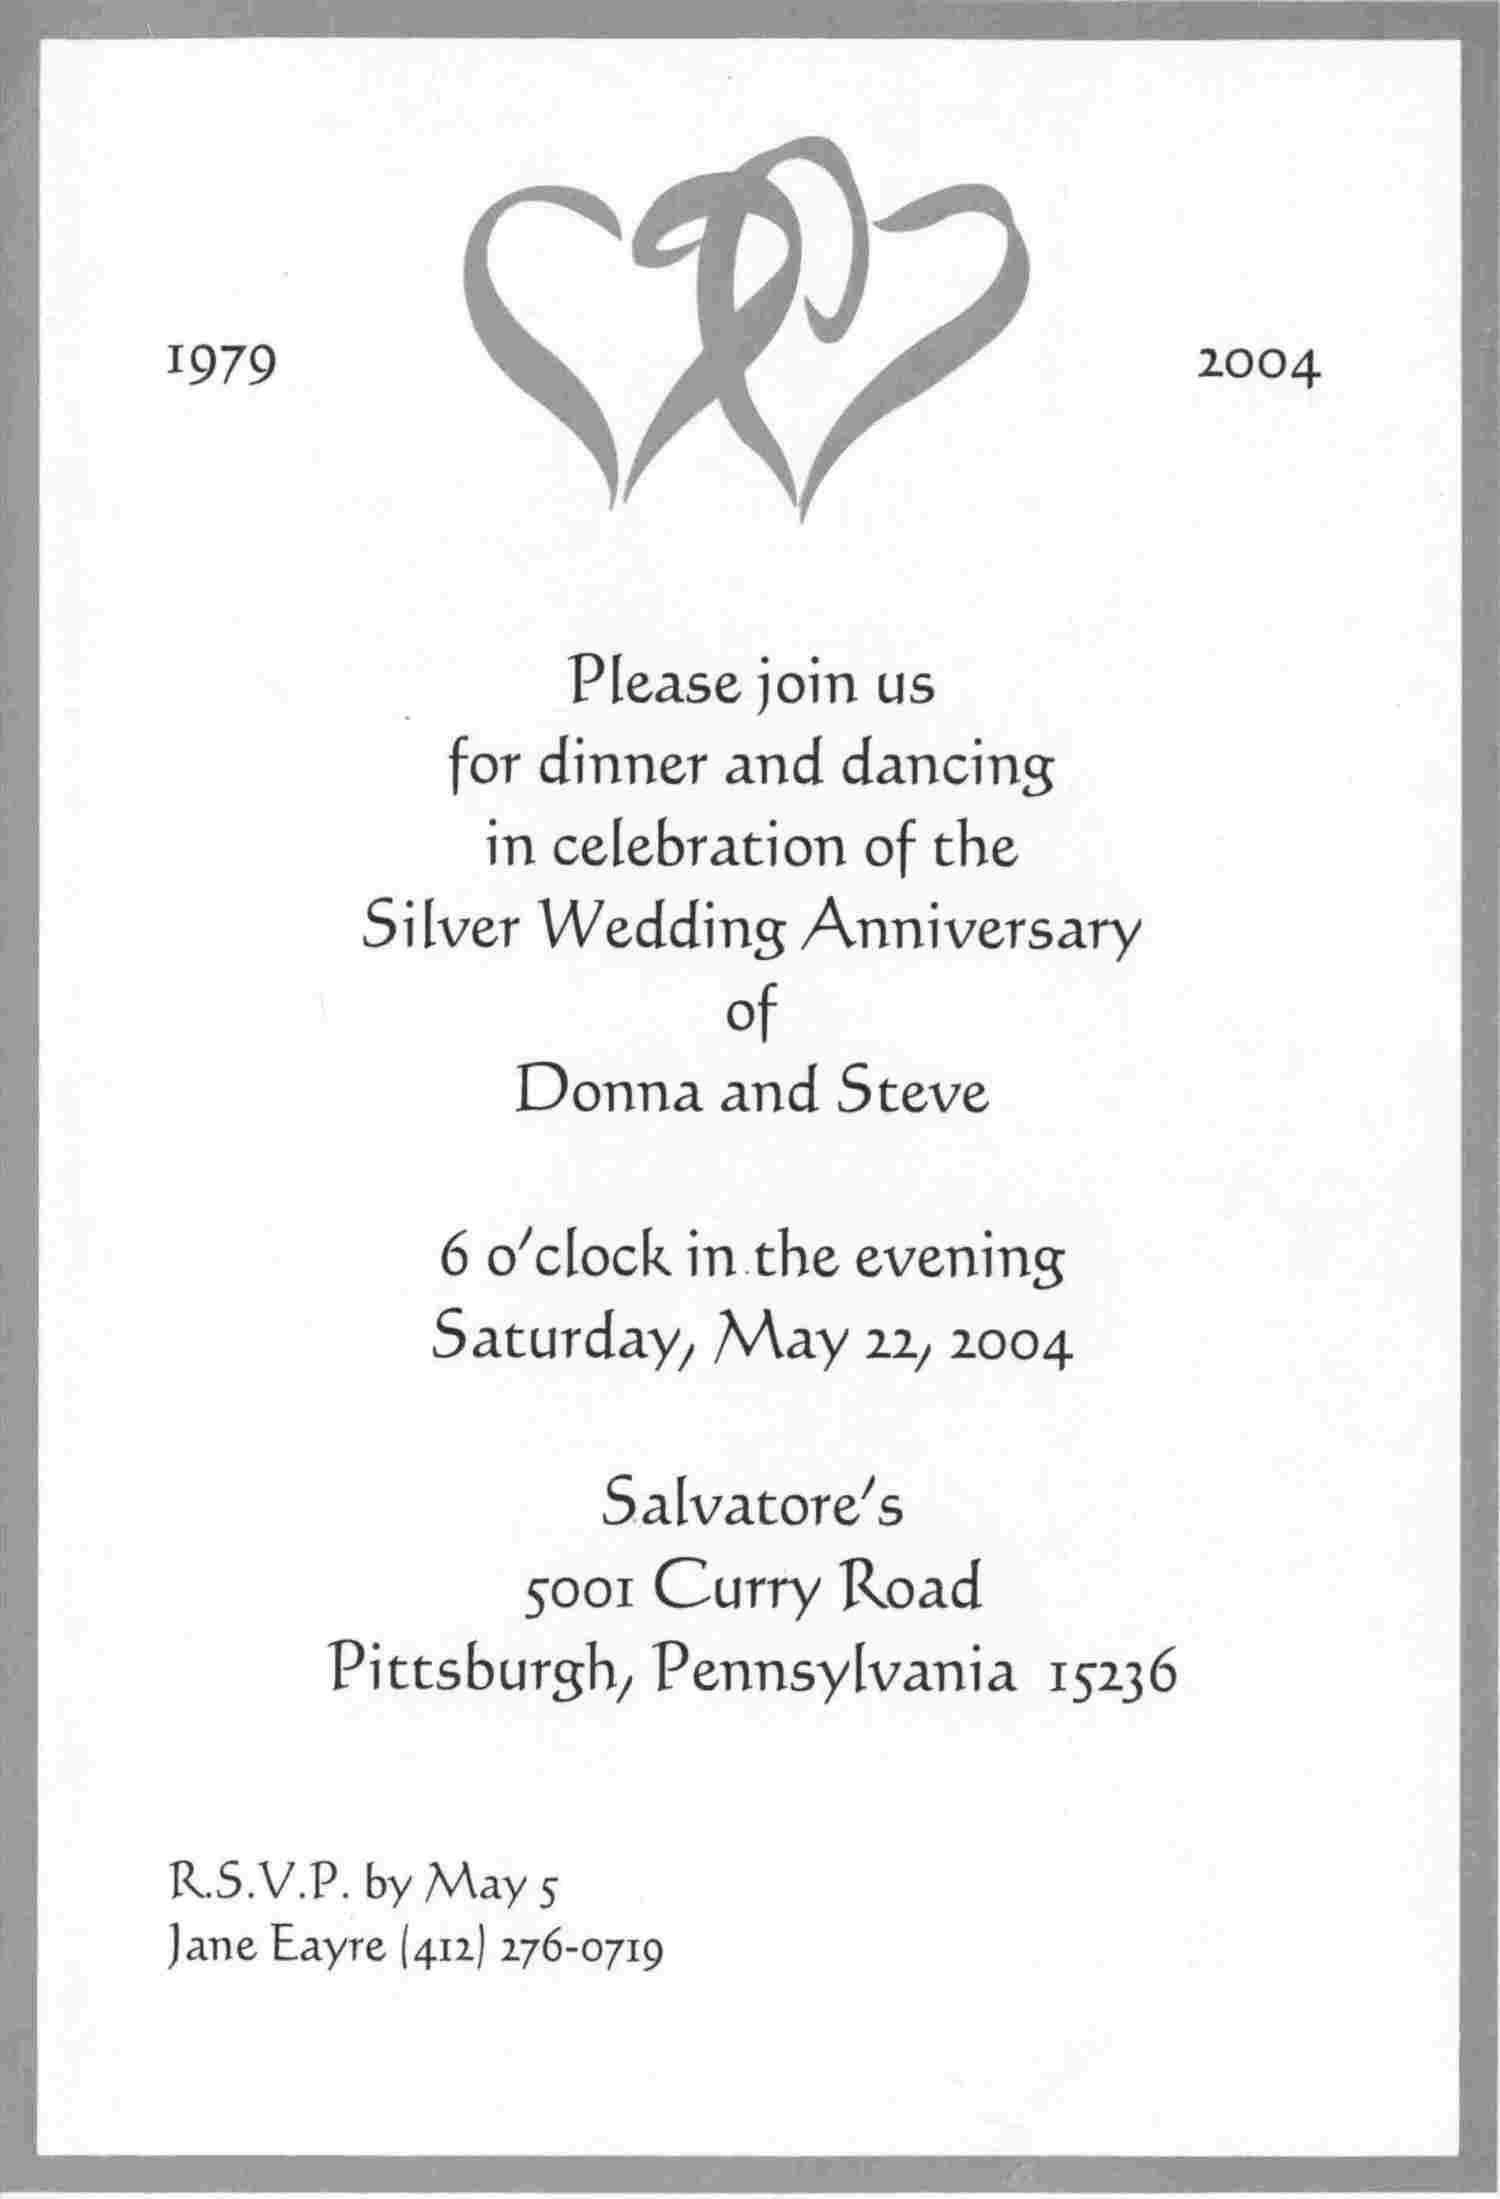 wedding invitation announcement